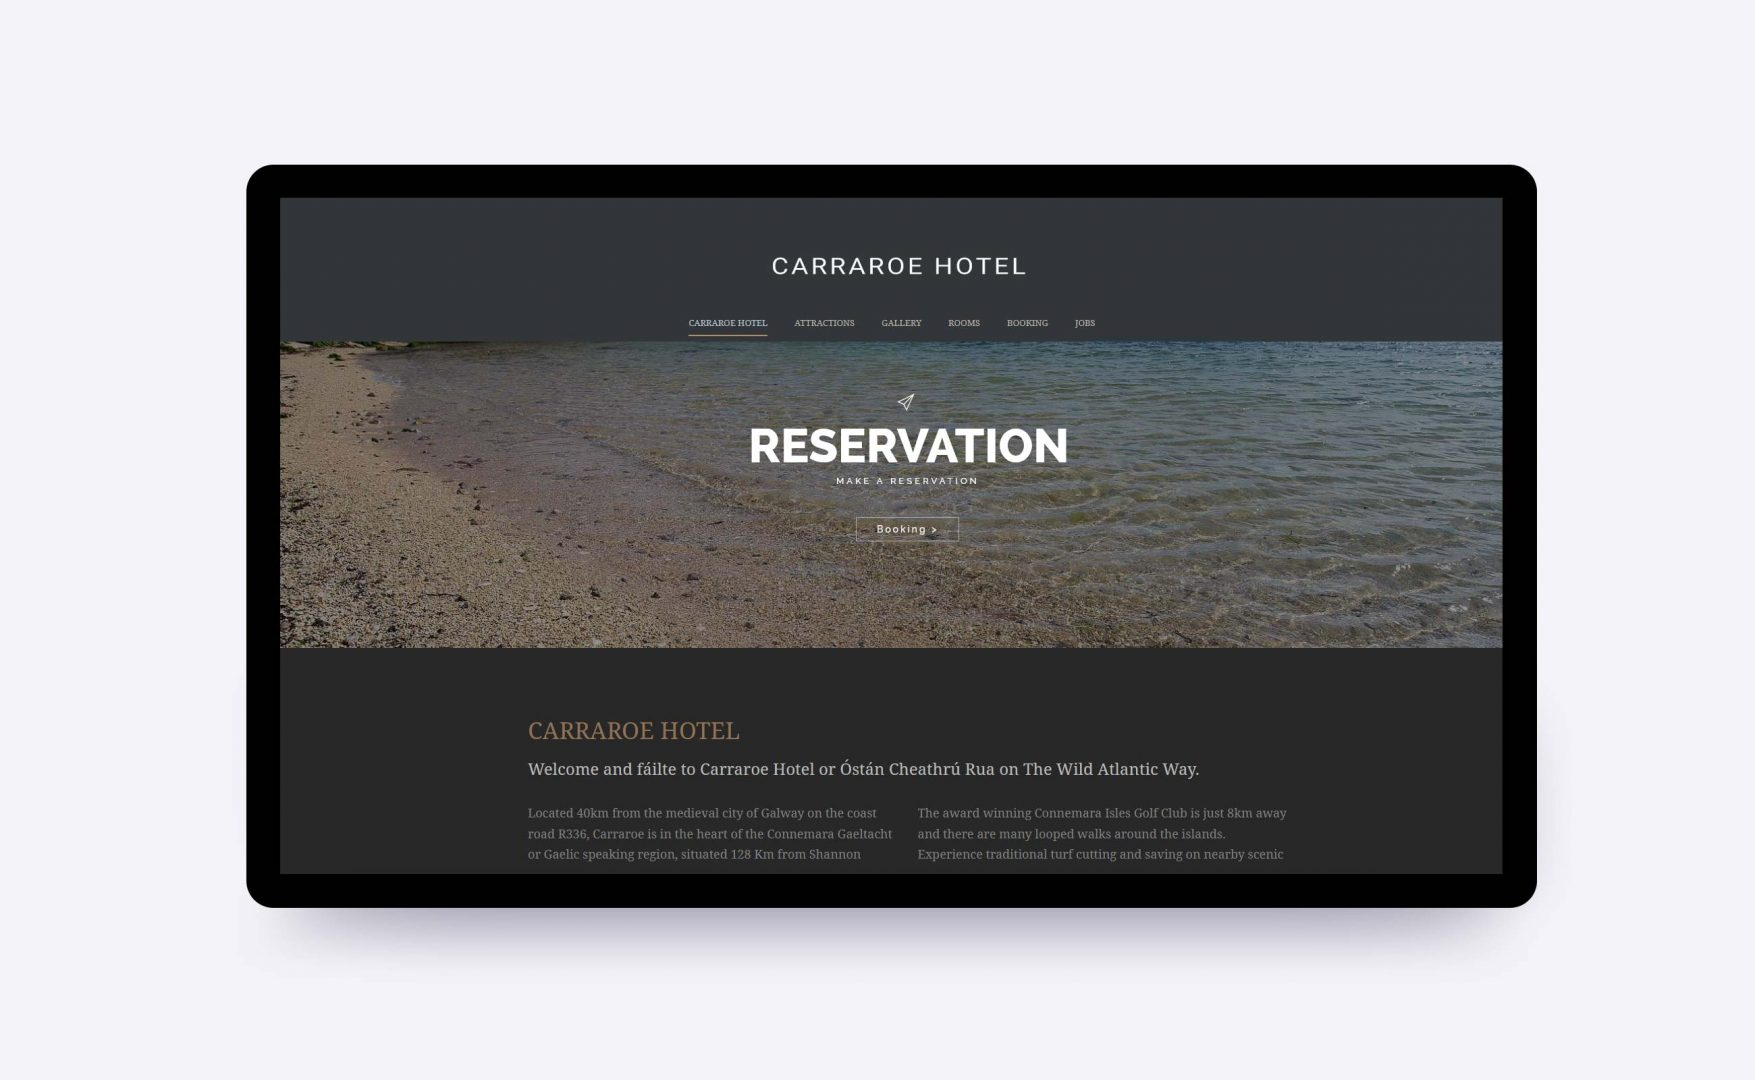 Carraroe Hotel